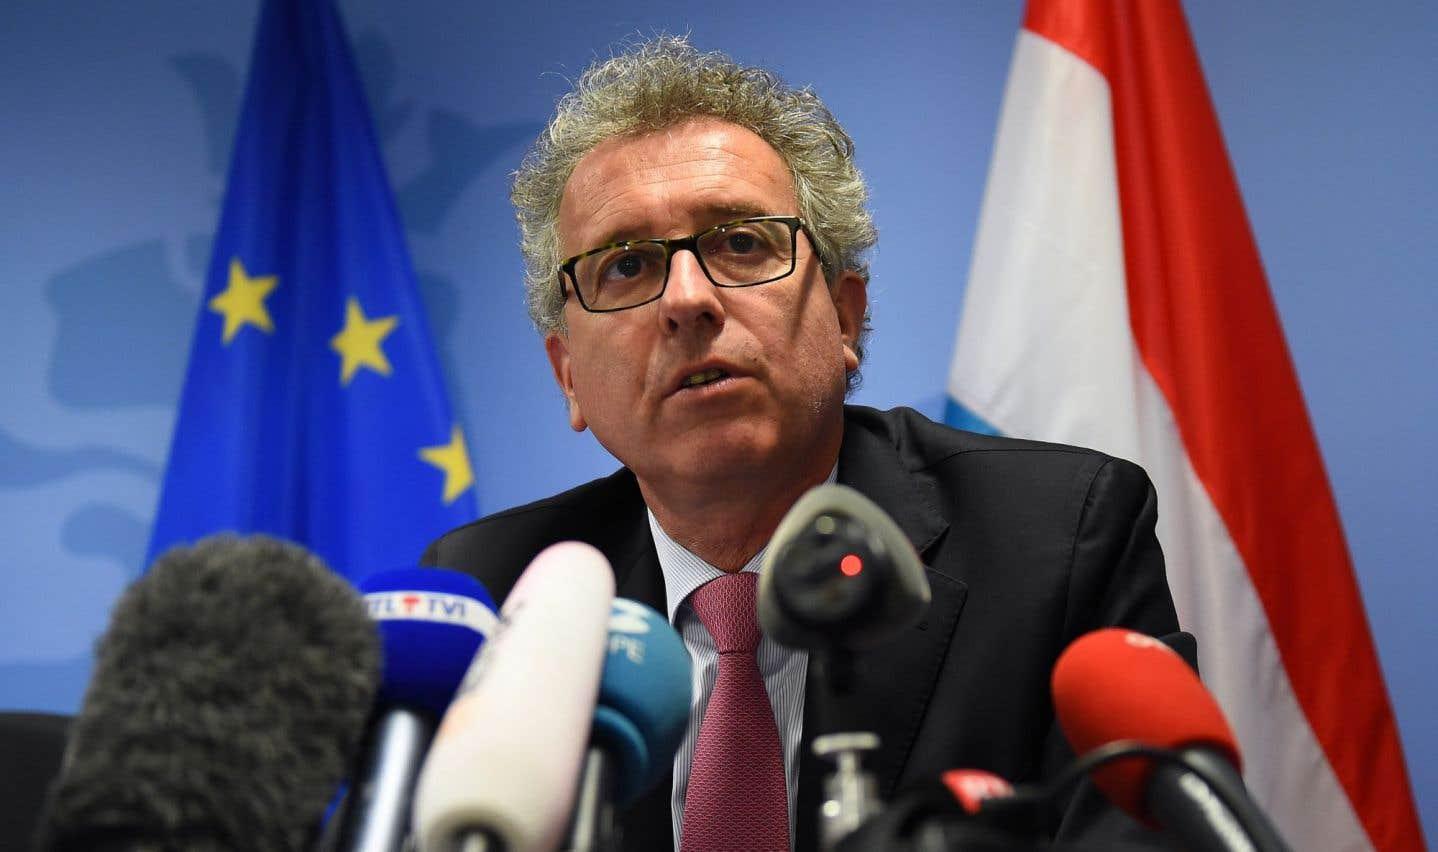 Le Luxembourg n'est pas que «tax rulings»